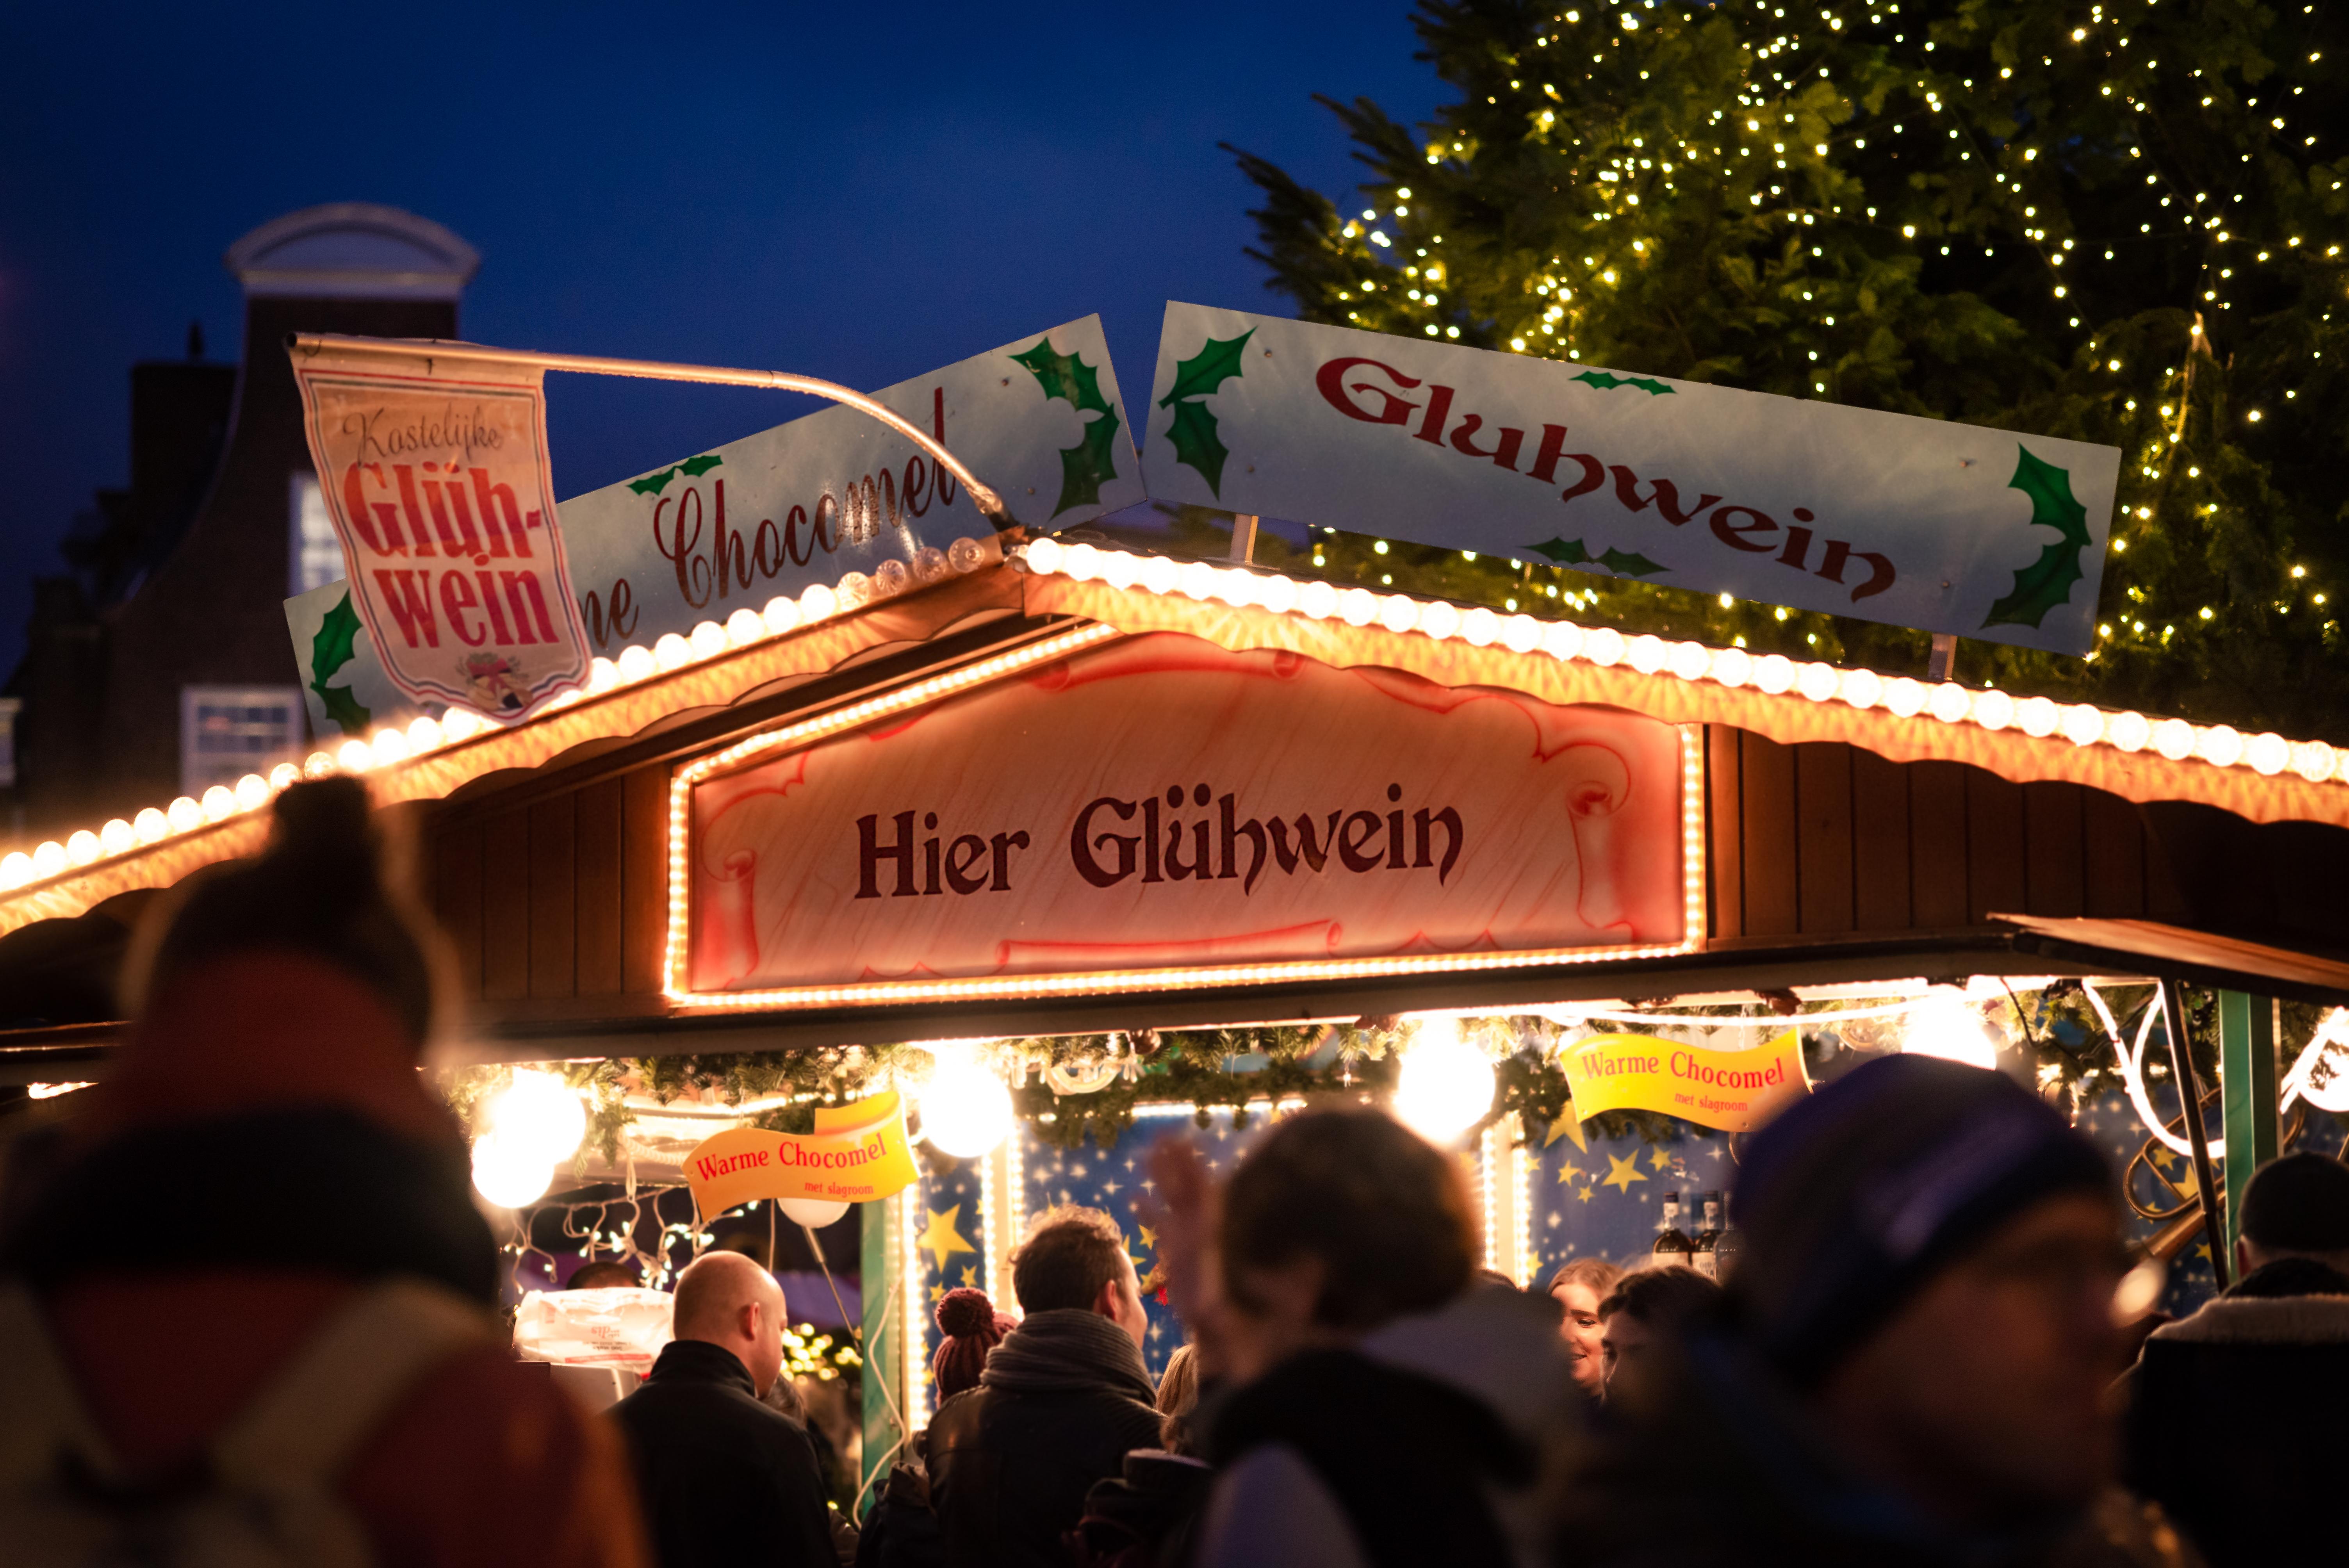 Glhwein in the Netherlands